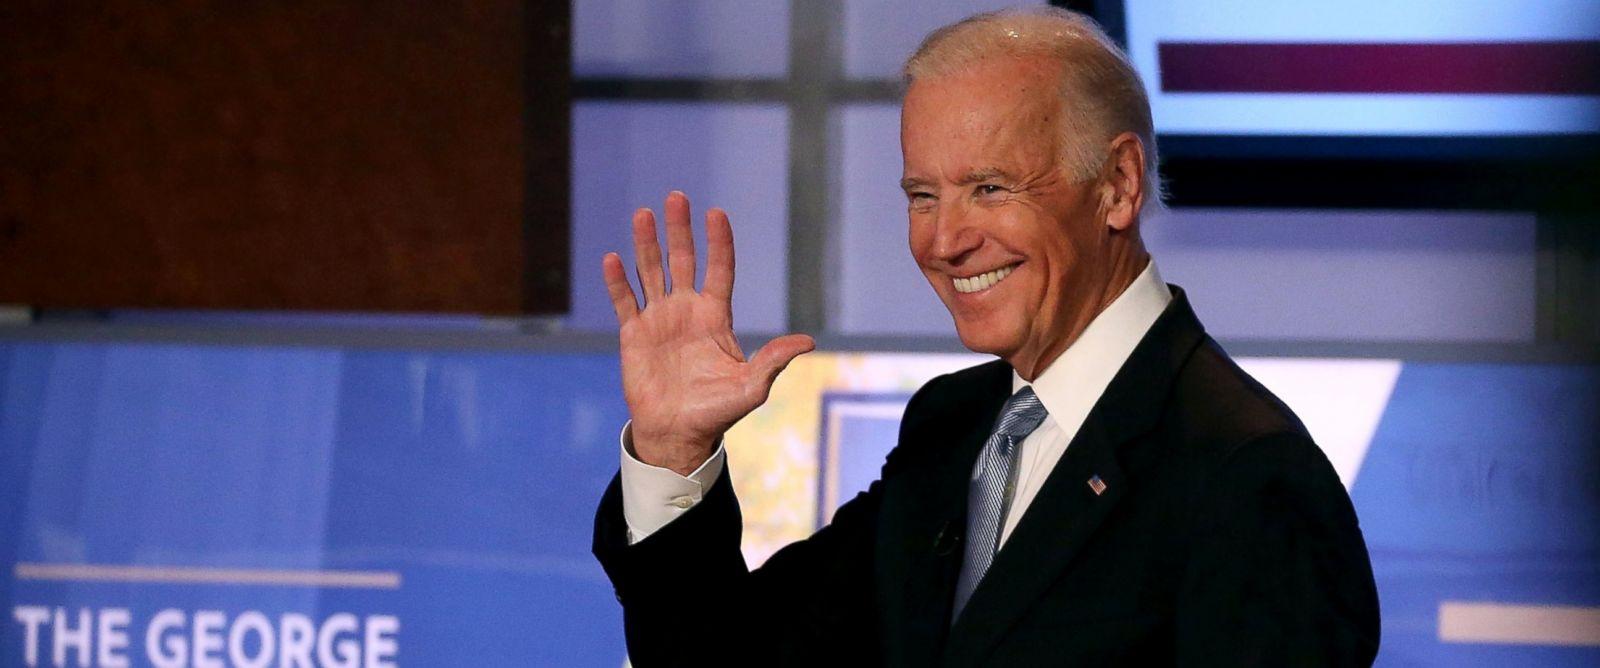 PHOTO: Vice President Joe Biden waves as he arrives at an event at George Washington University, Oct. 20, 2015, in Washington.